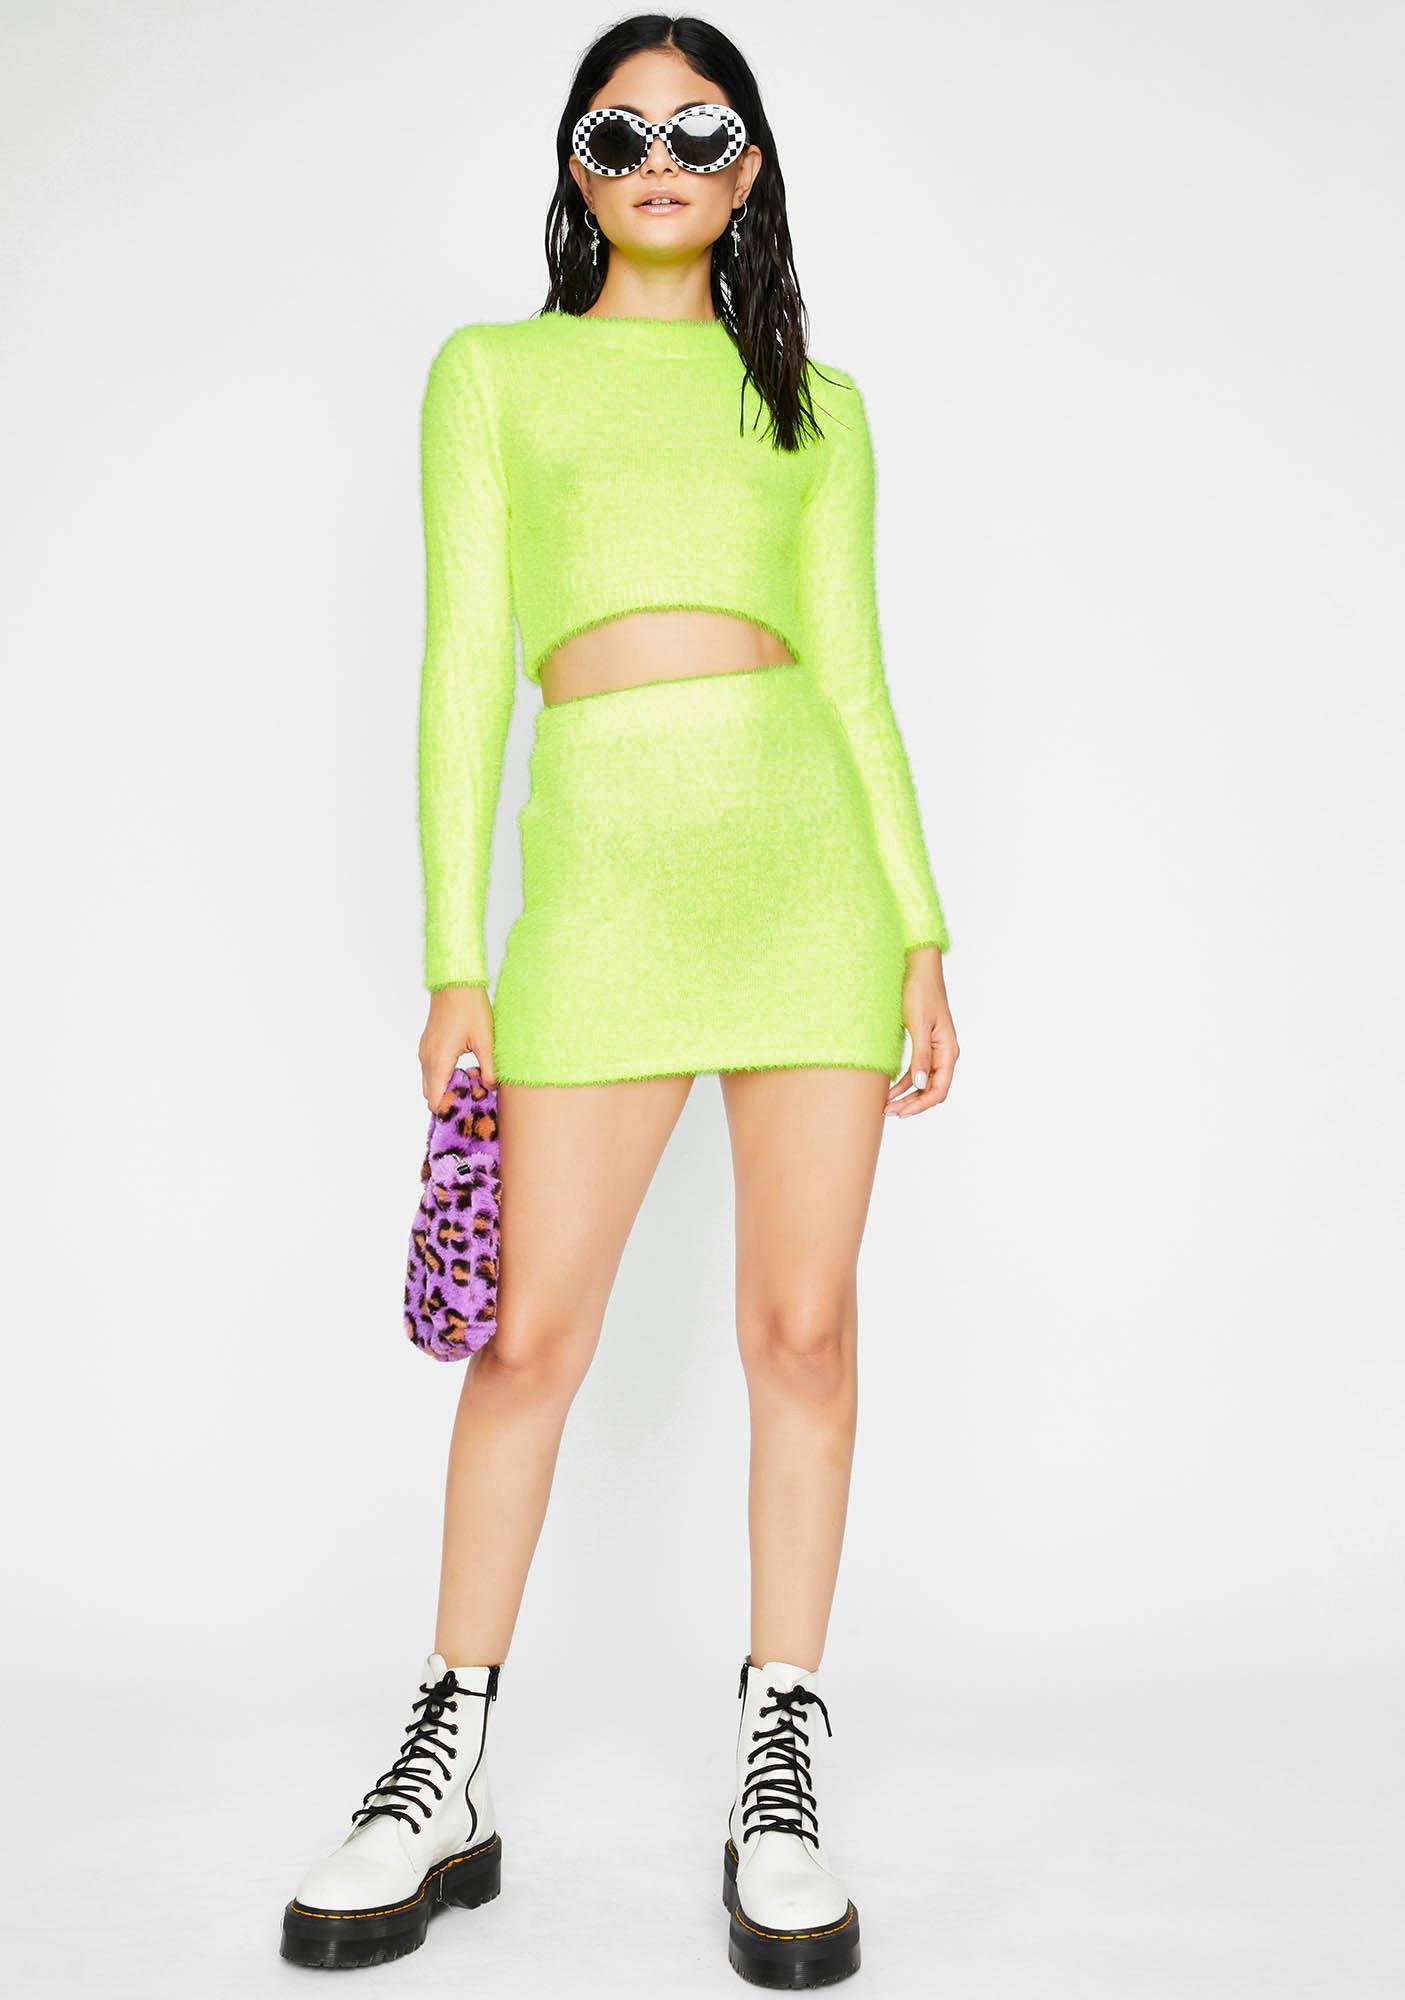 Electric Fuzzy Freaq Skirt Set